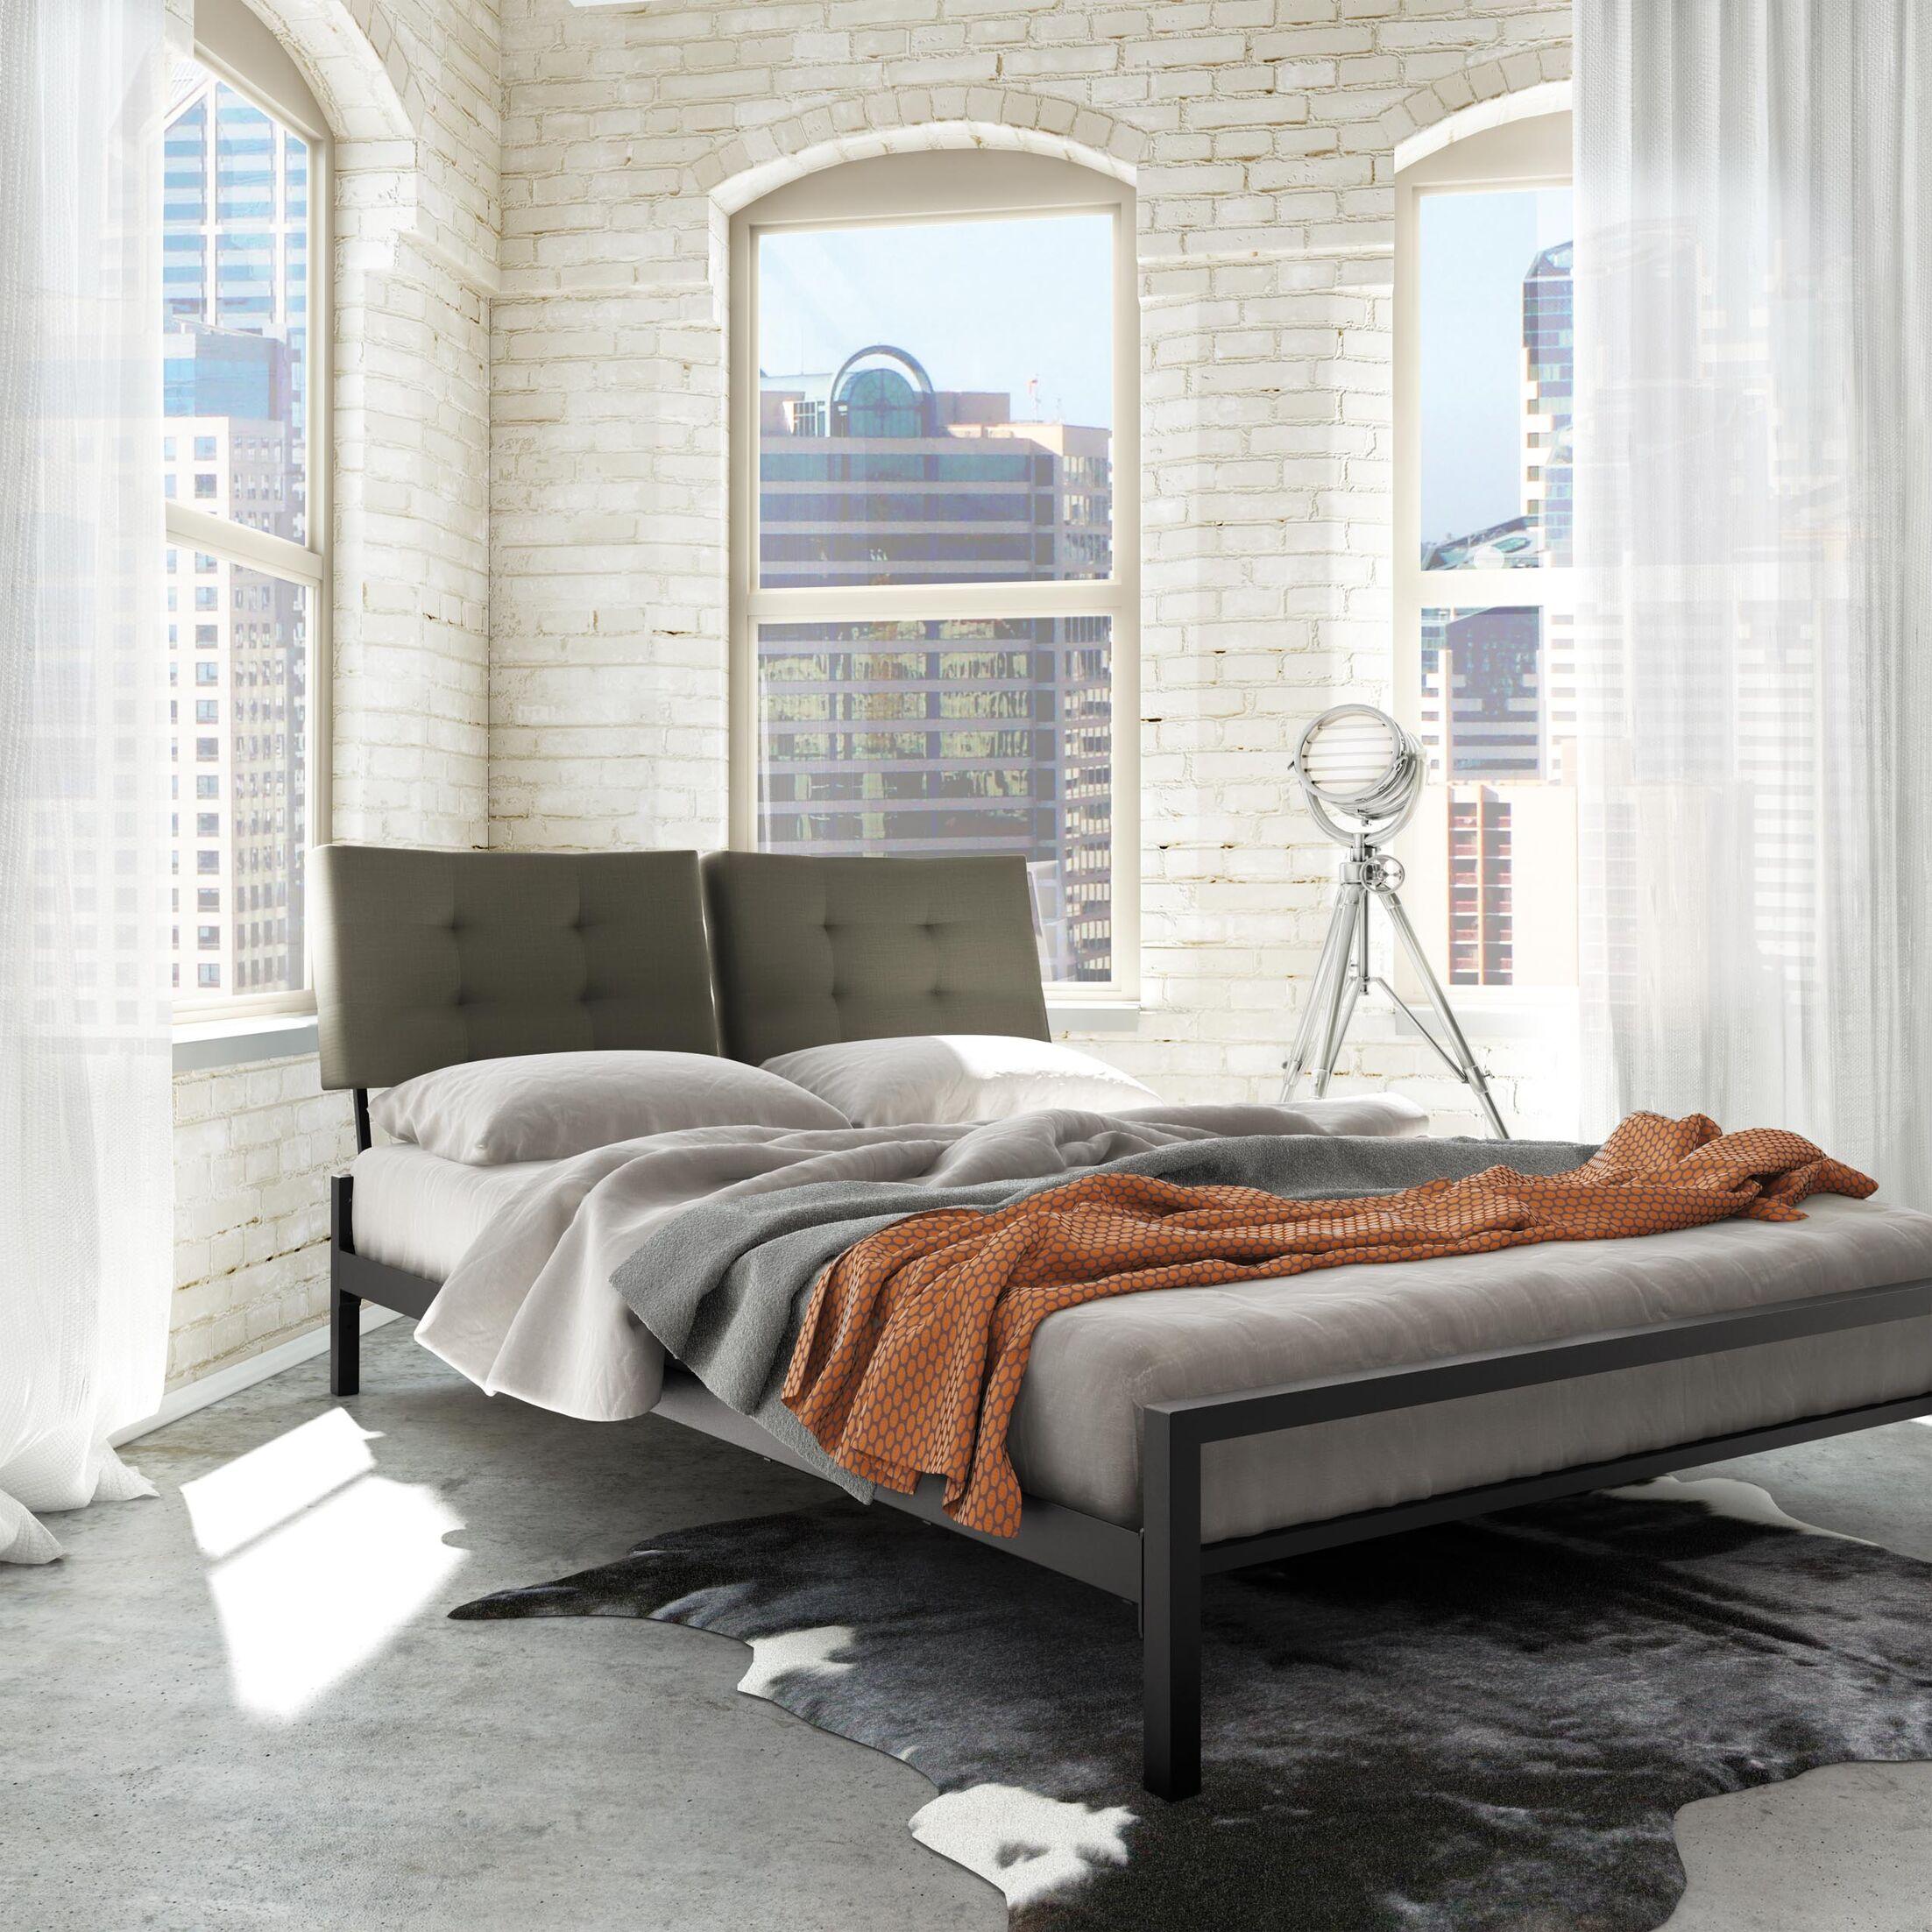 Maxton Upholstered Platform Bed Size: Queen, Color (Headboard/Frame): Grey Polyurethane/Brown Metal